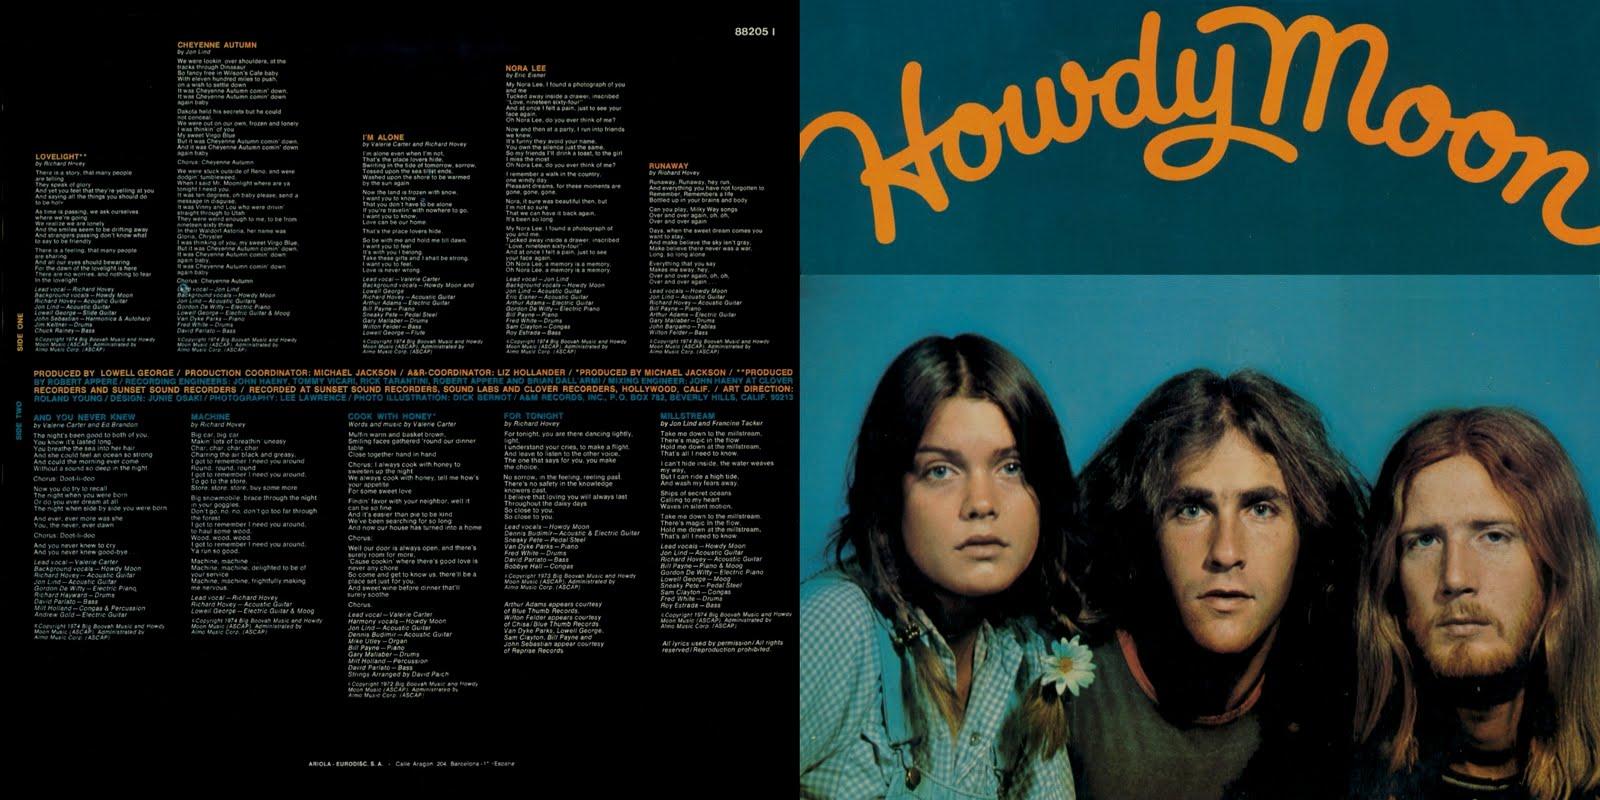 self titled album in 1974